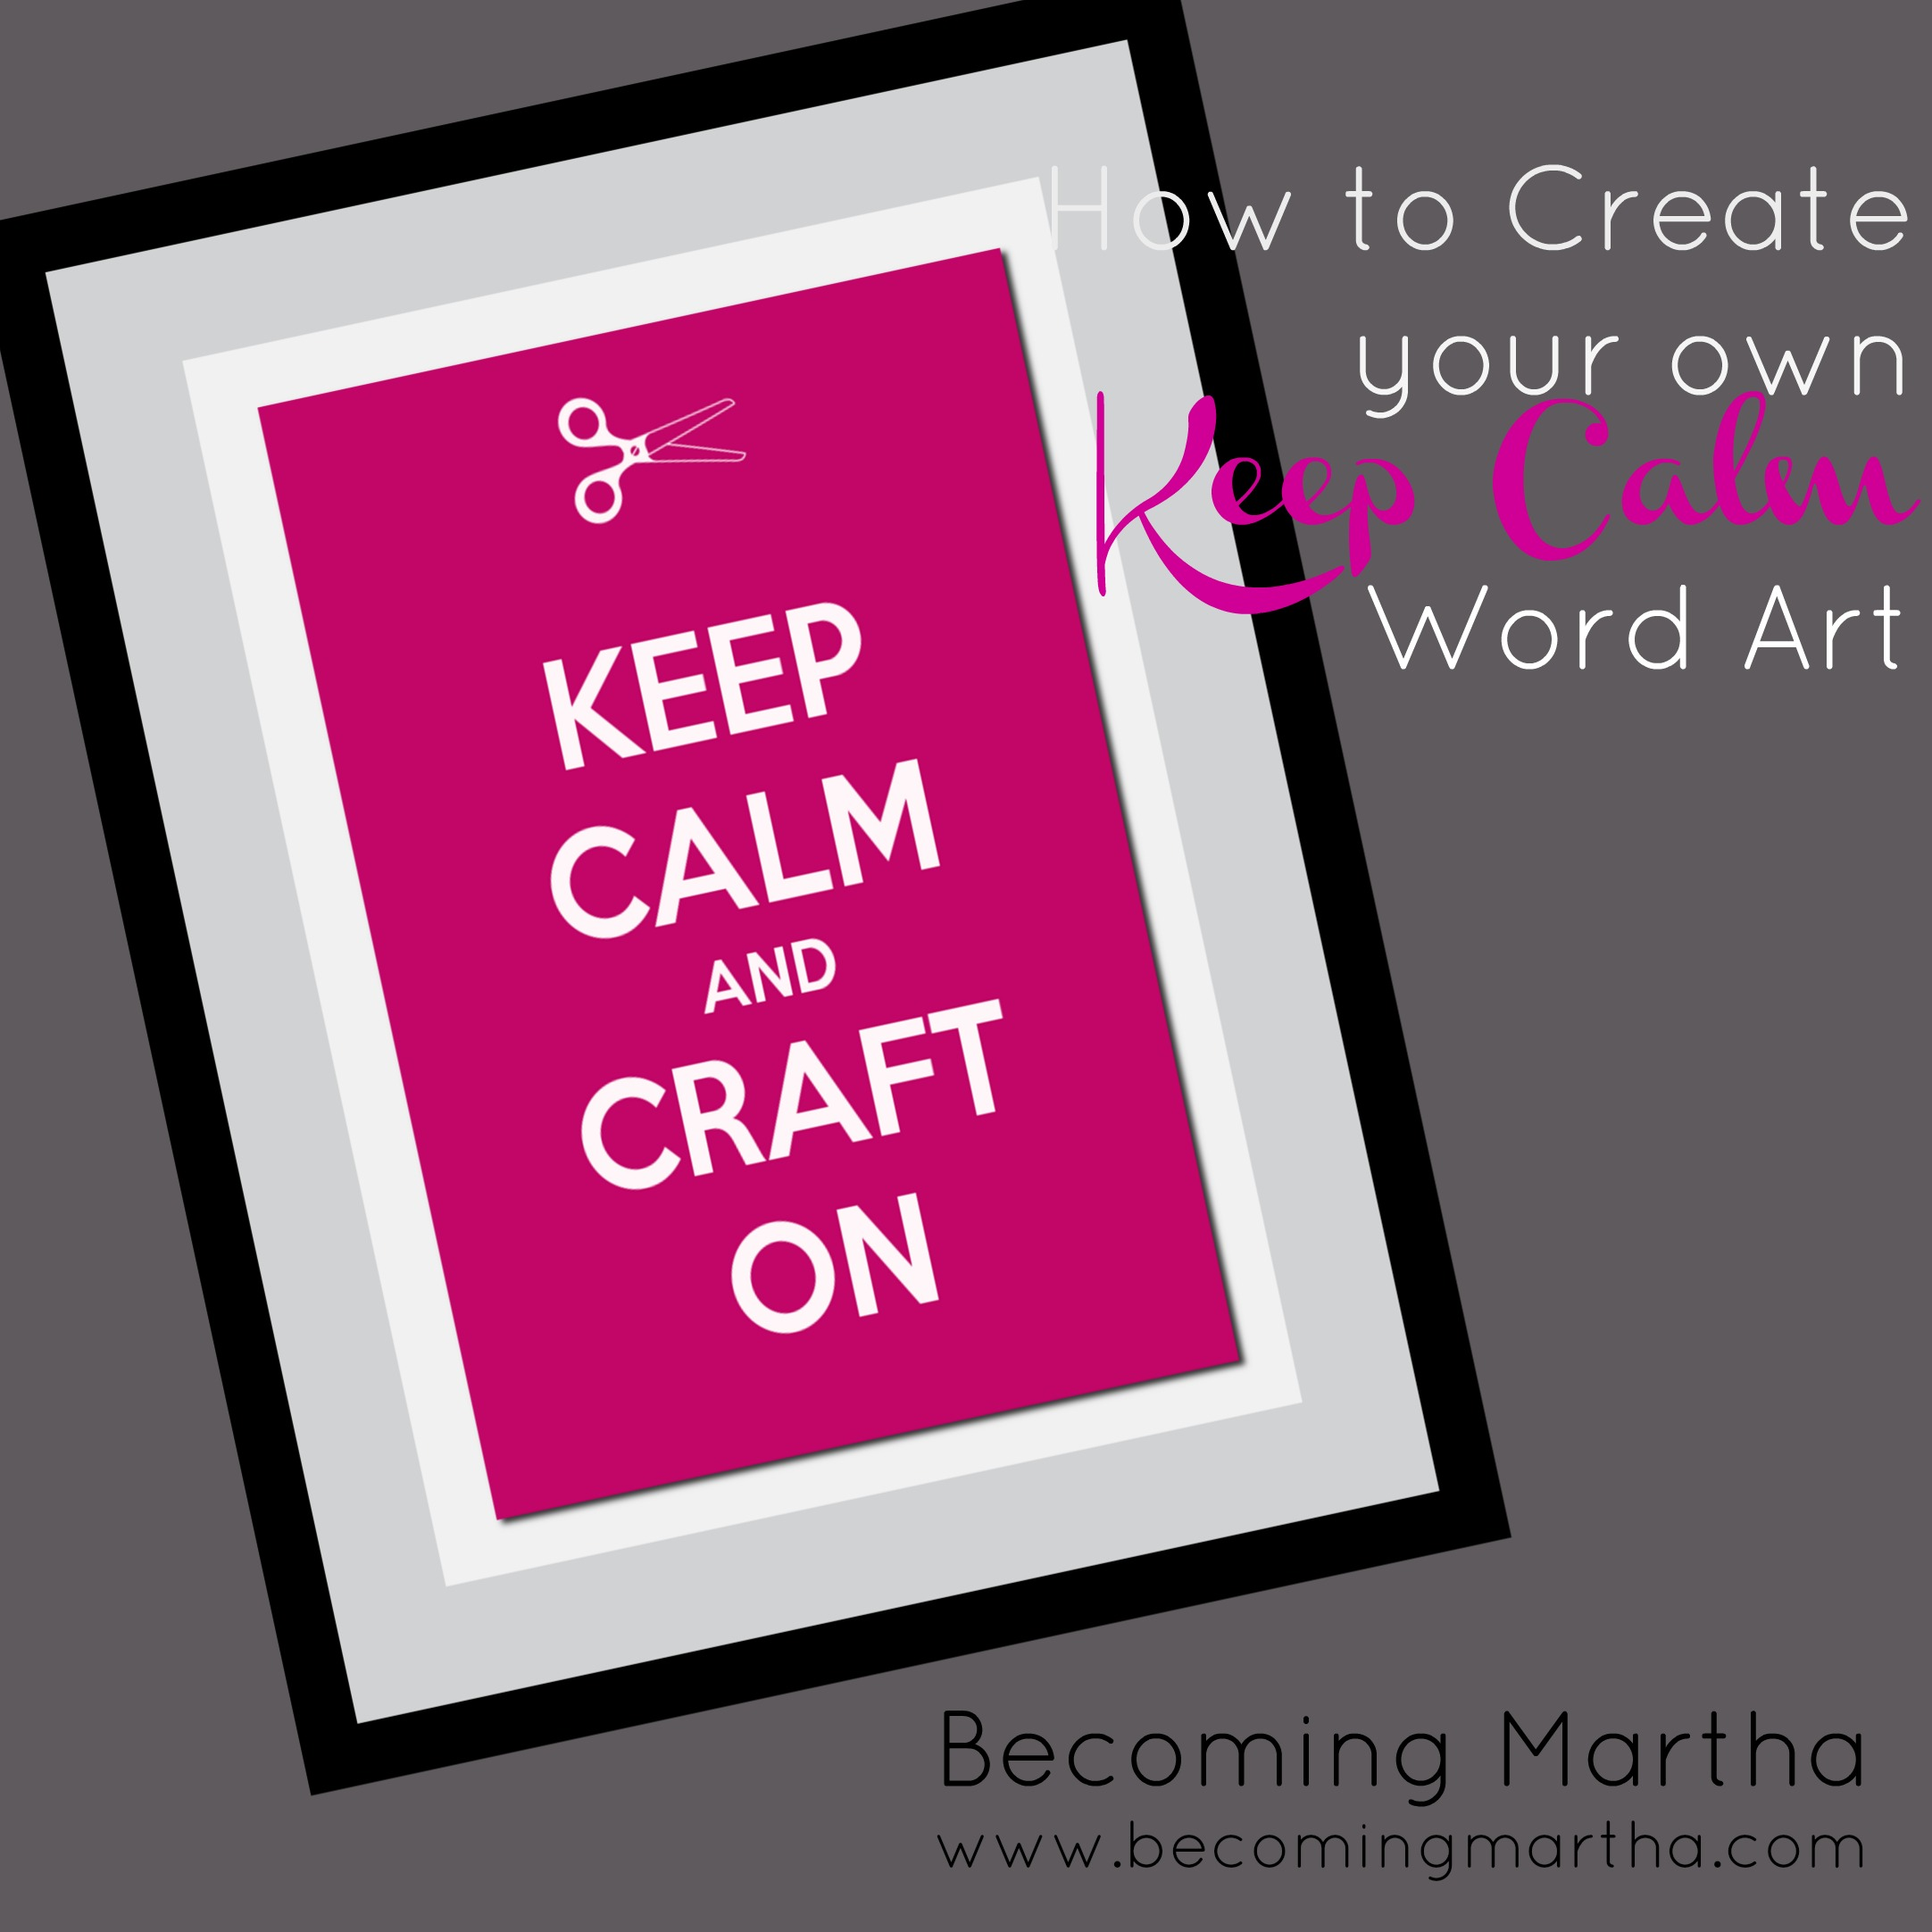 Keep Calm and… Make More Word Art!